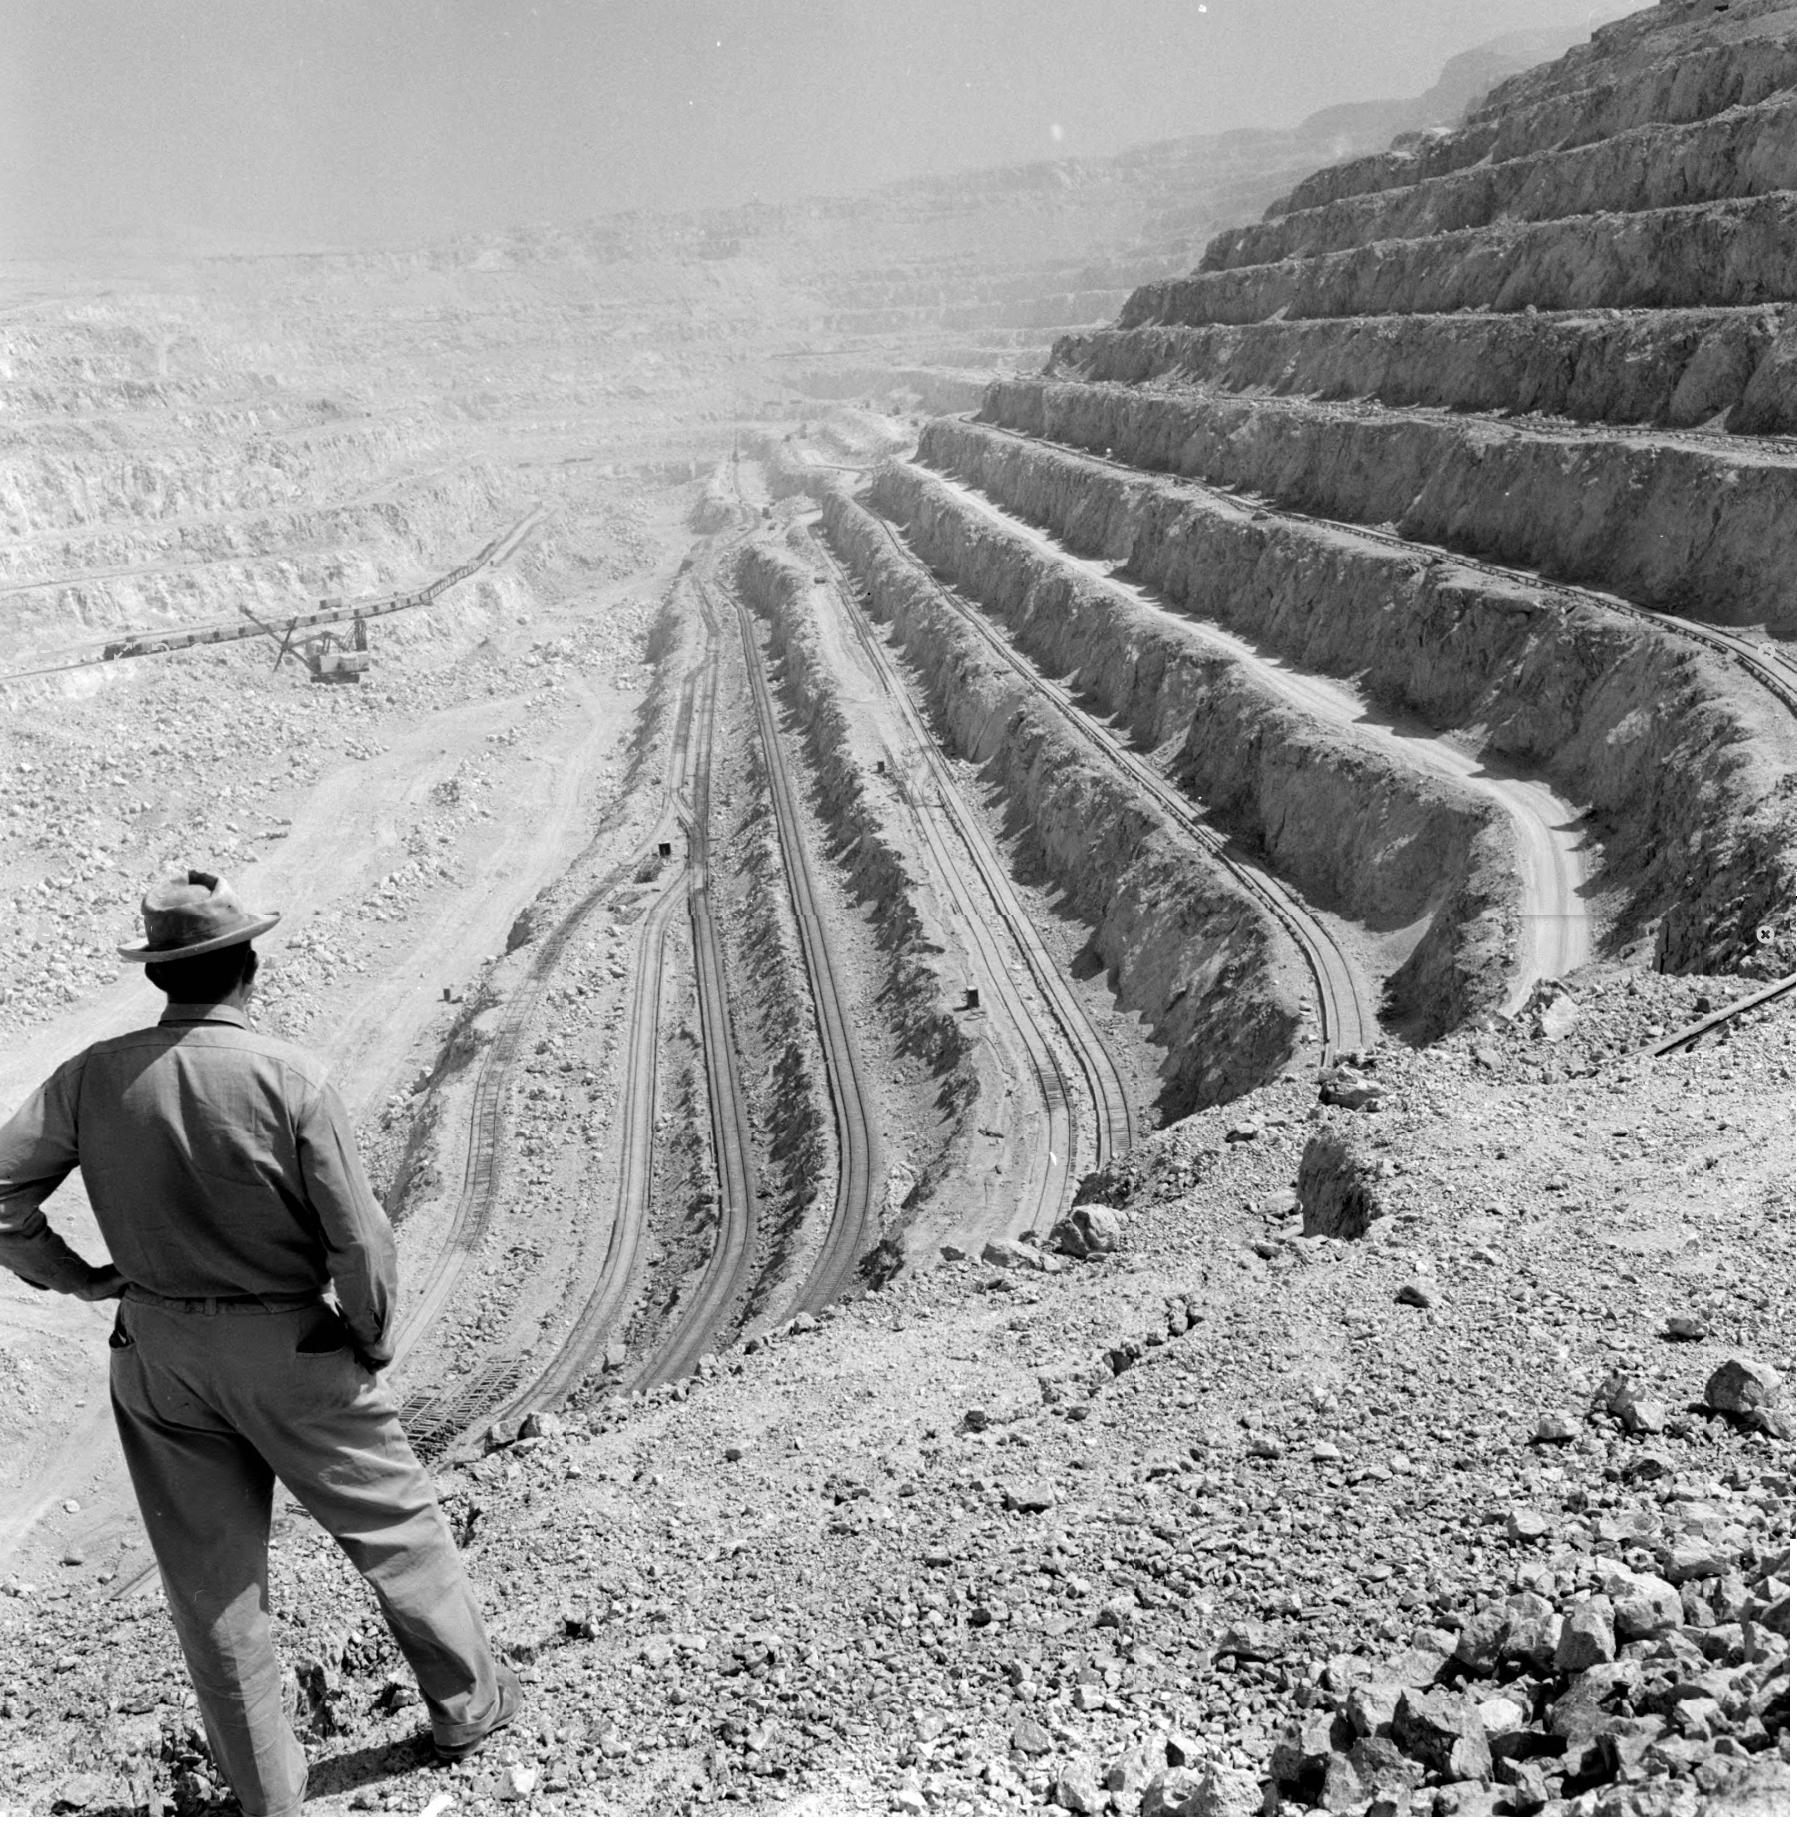 Enterreno - Fotos históricas de chile - fotos antiguas de Chile - Mina a tajo abierto de Chuquicamata, 1958